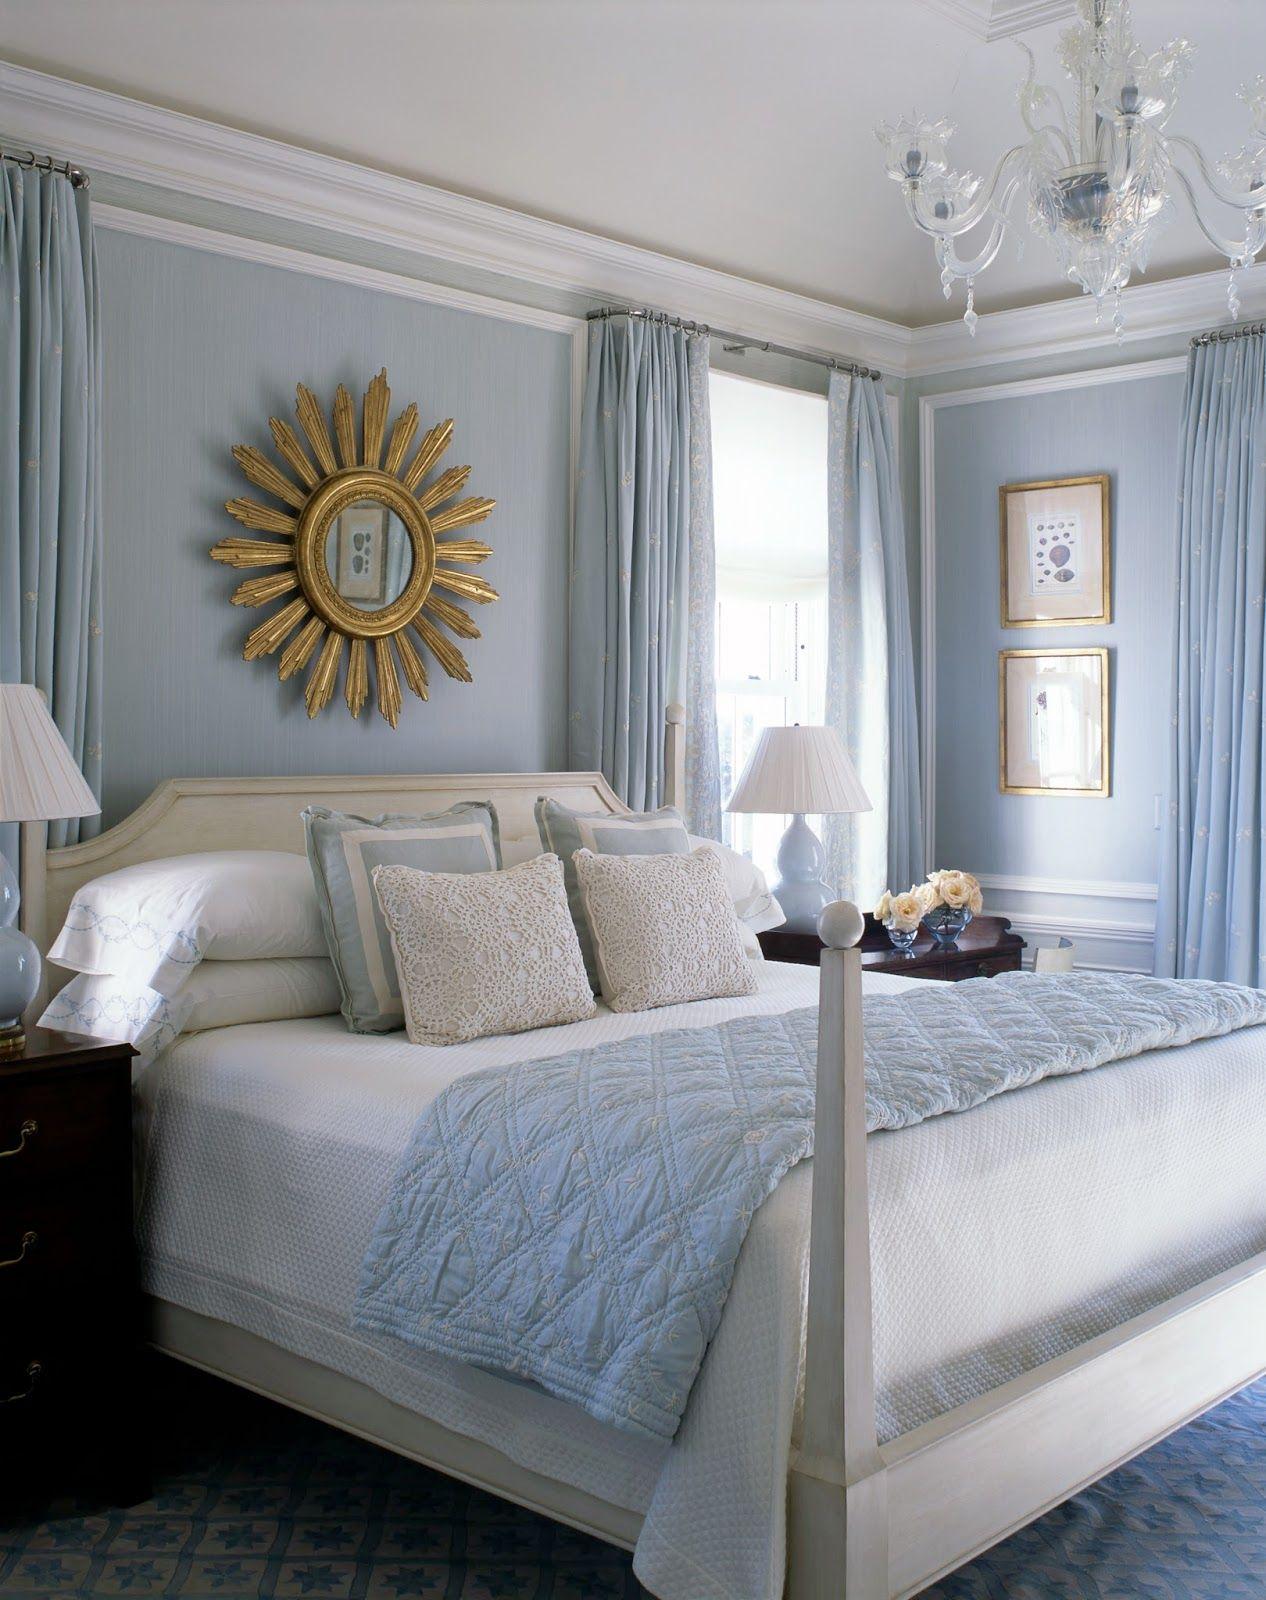 1 Bedroom Apartments In Athens Ga Blue bedroom decor